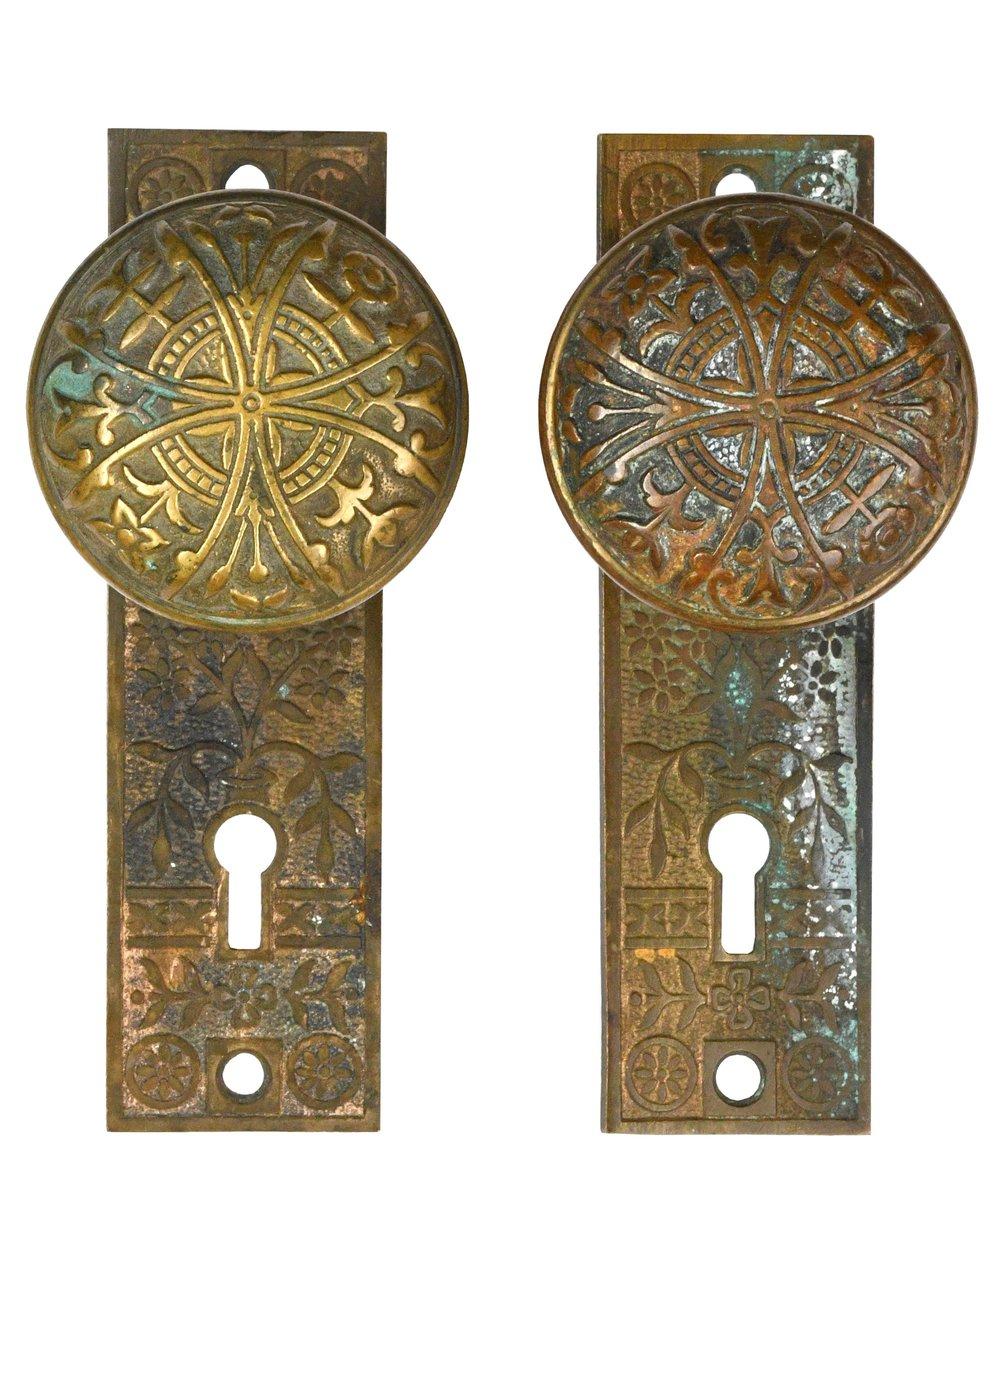 h20035-eastlake-brass-knob-set-MAIN.jpg